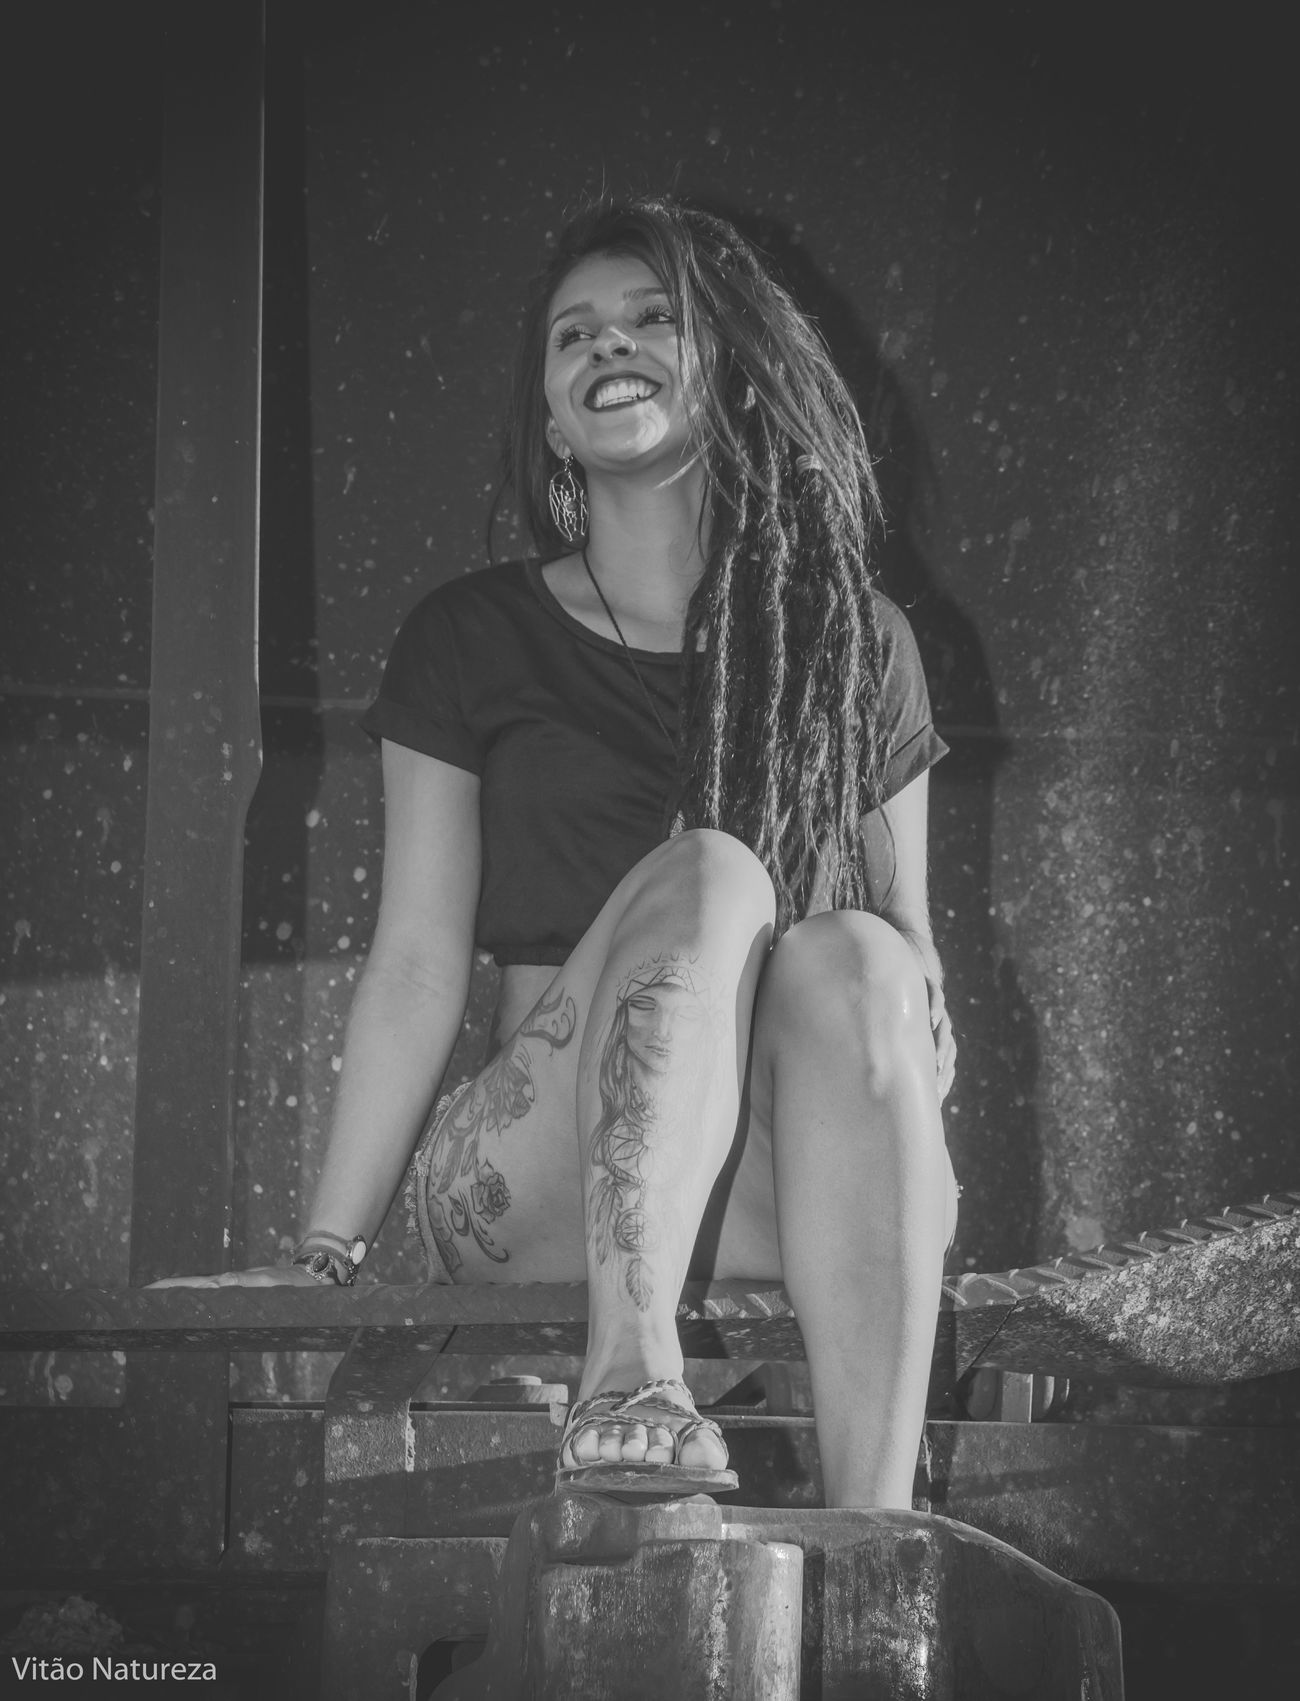 Belezafeminina Ensaiofeminino Ensaioexterno Olharnatural Vitaonatureza Victornatureza Fotografiaéarte Nikonphotography Mulher Ensaiofotografico Dreds  Braziliangirl Beleza Fotografia Morena Ensaio Nikon D7000 Natureza Photography Sun Brunette Tattoo Model Girl Fotodocumental